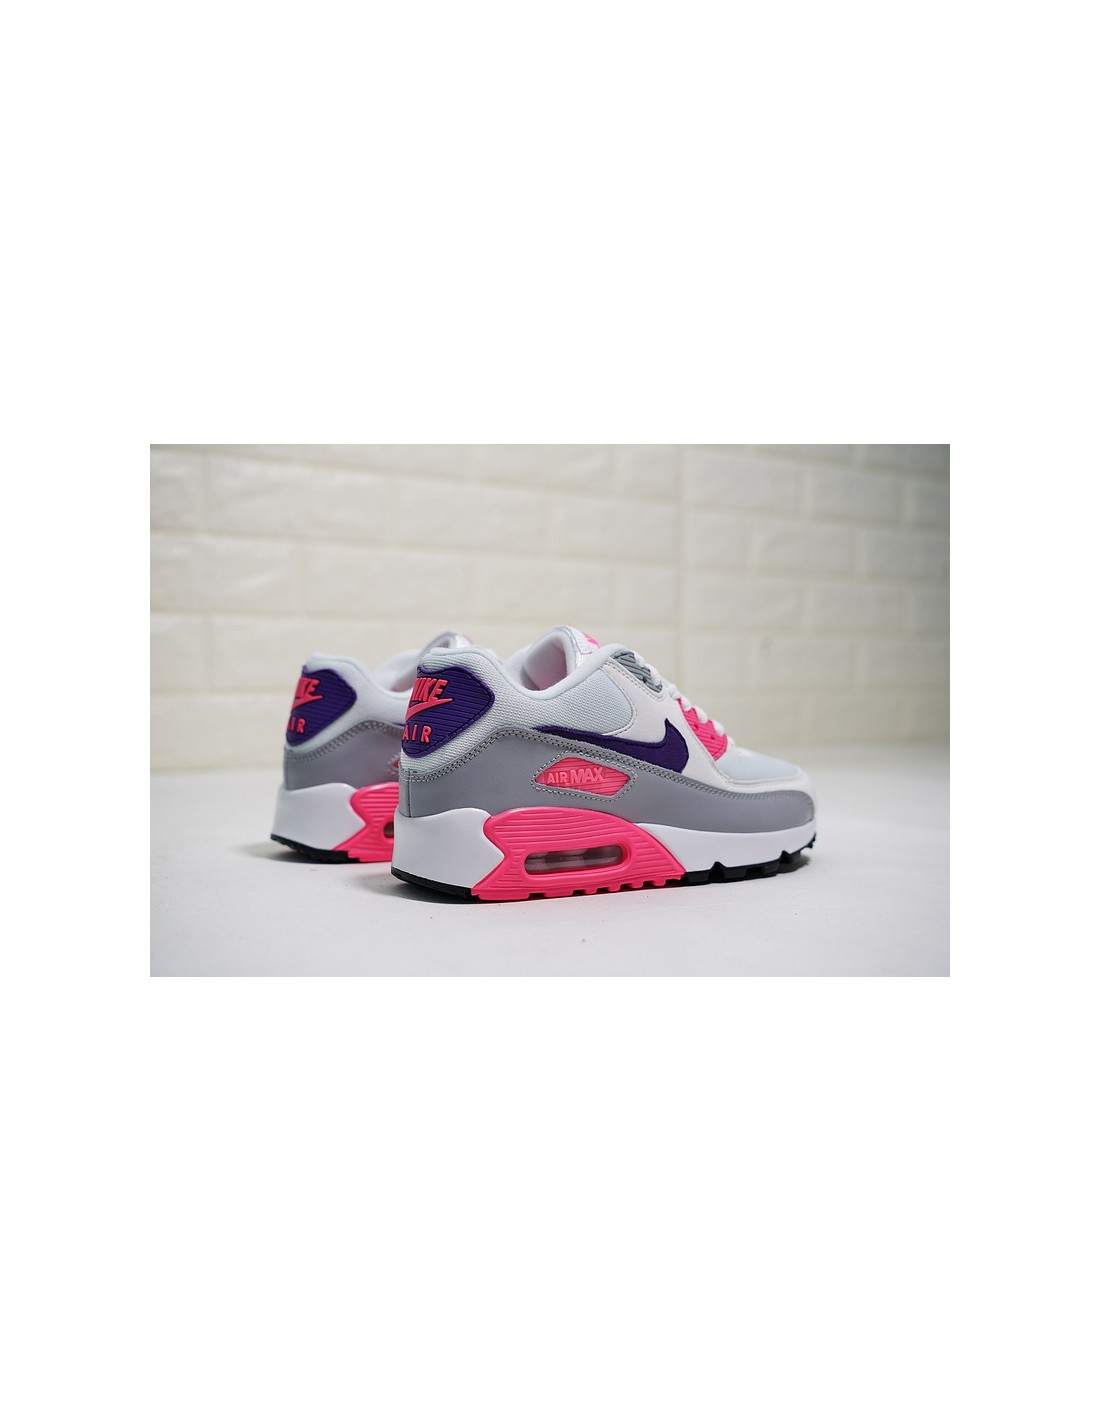 Attractive Nike Air Max 90 Ultra Pink Sportswear 2.0 Sneaker